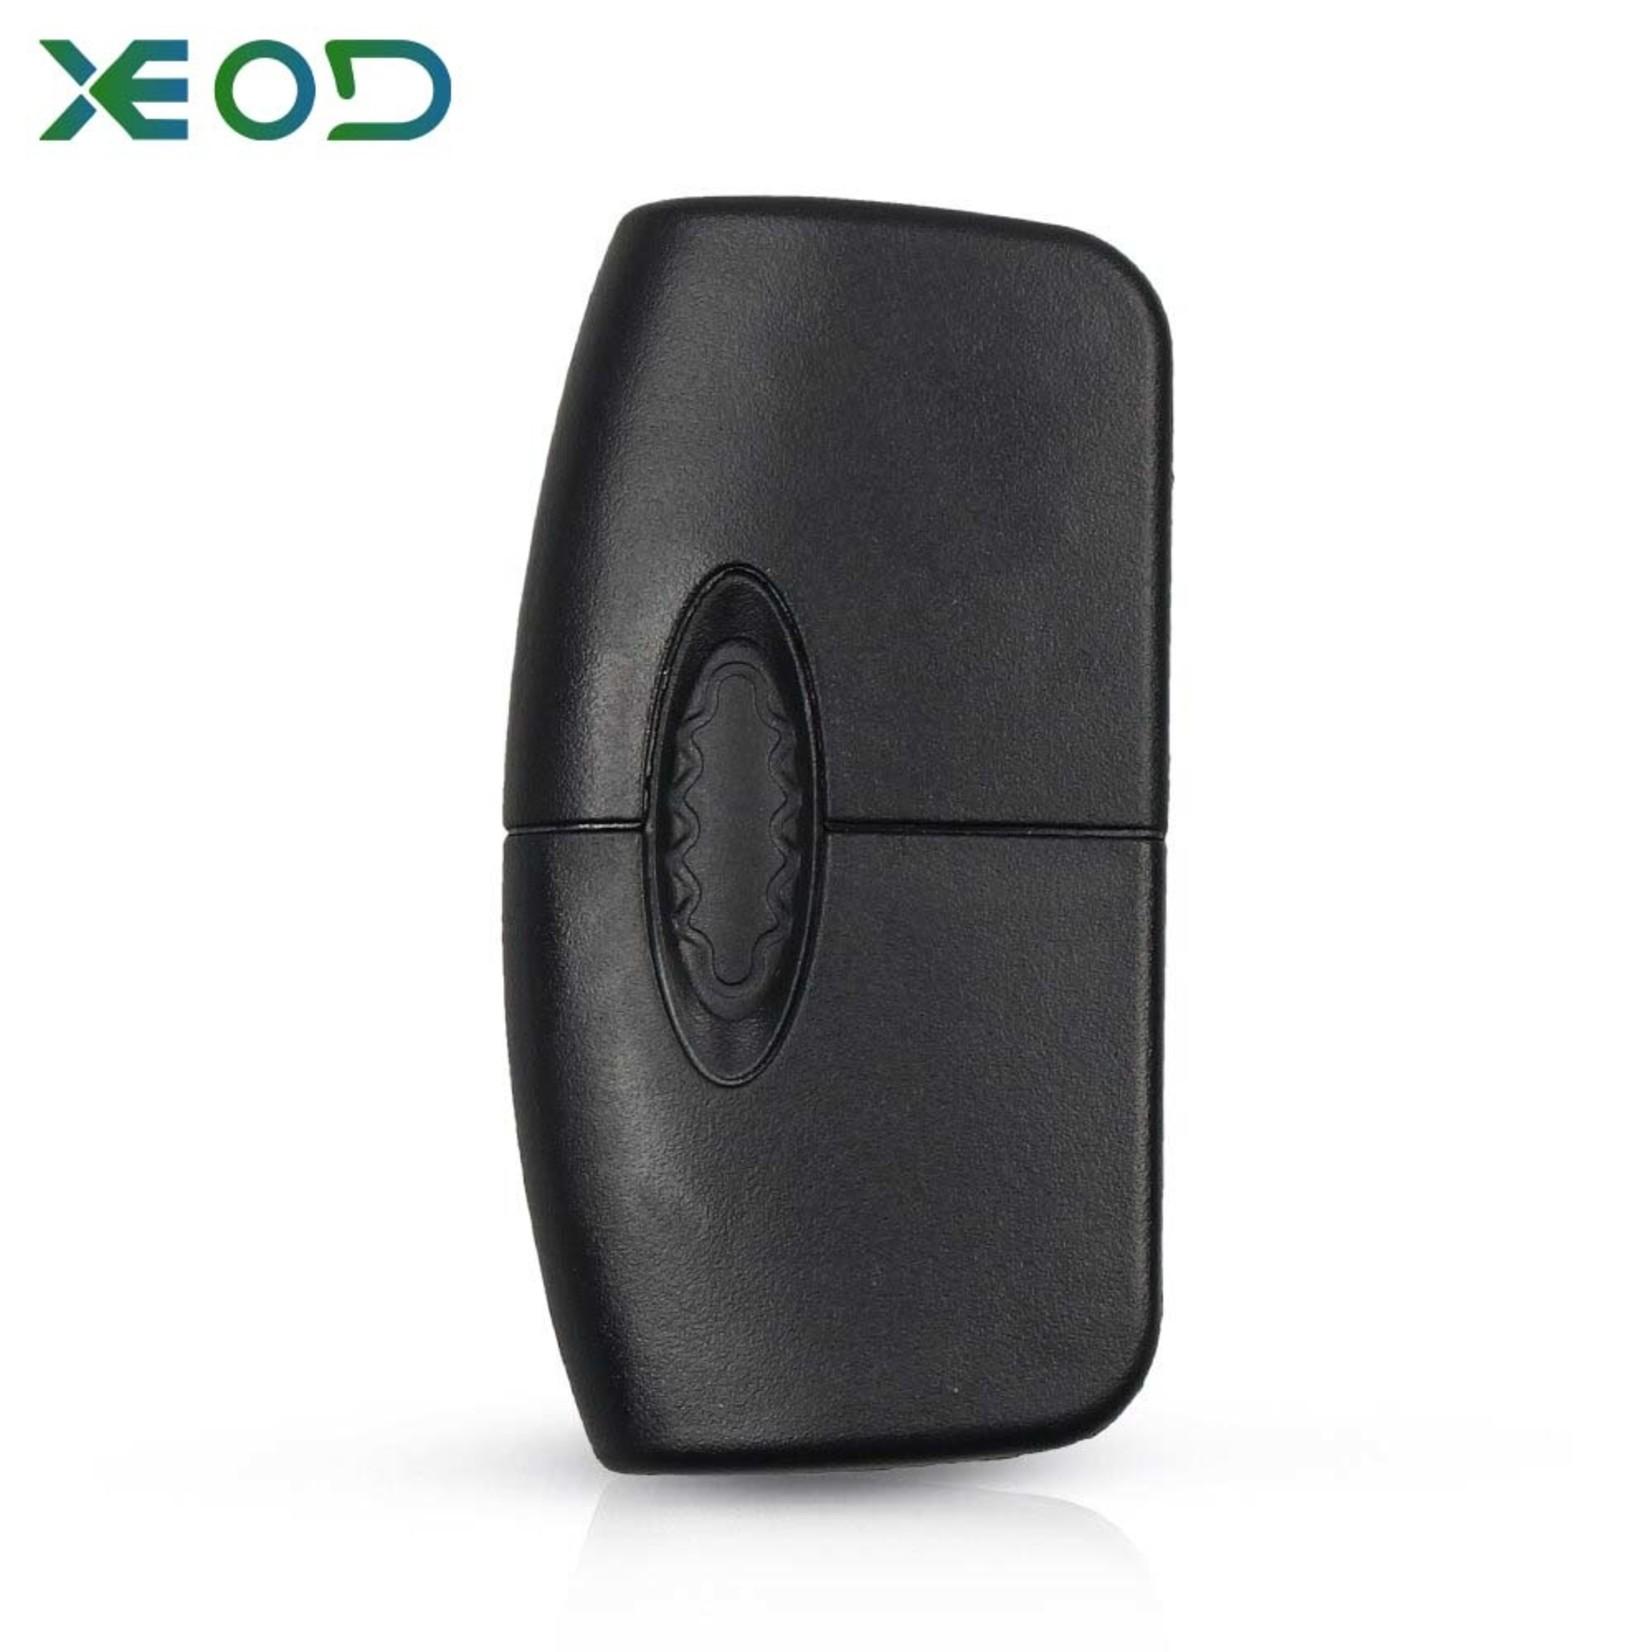 XEOD Ford klap sleutelbehuizing 3-knops